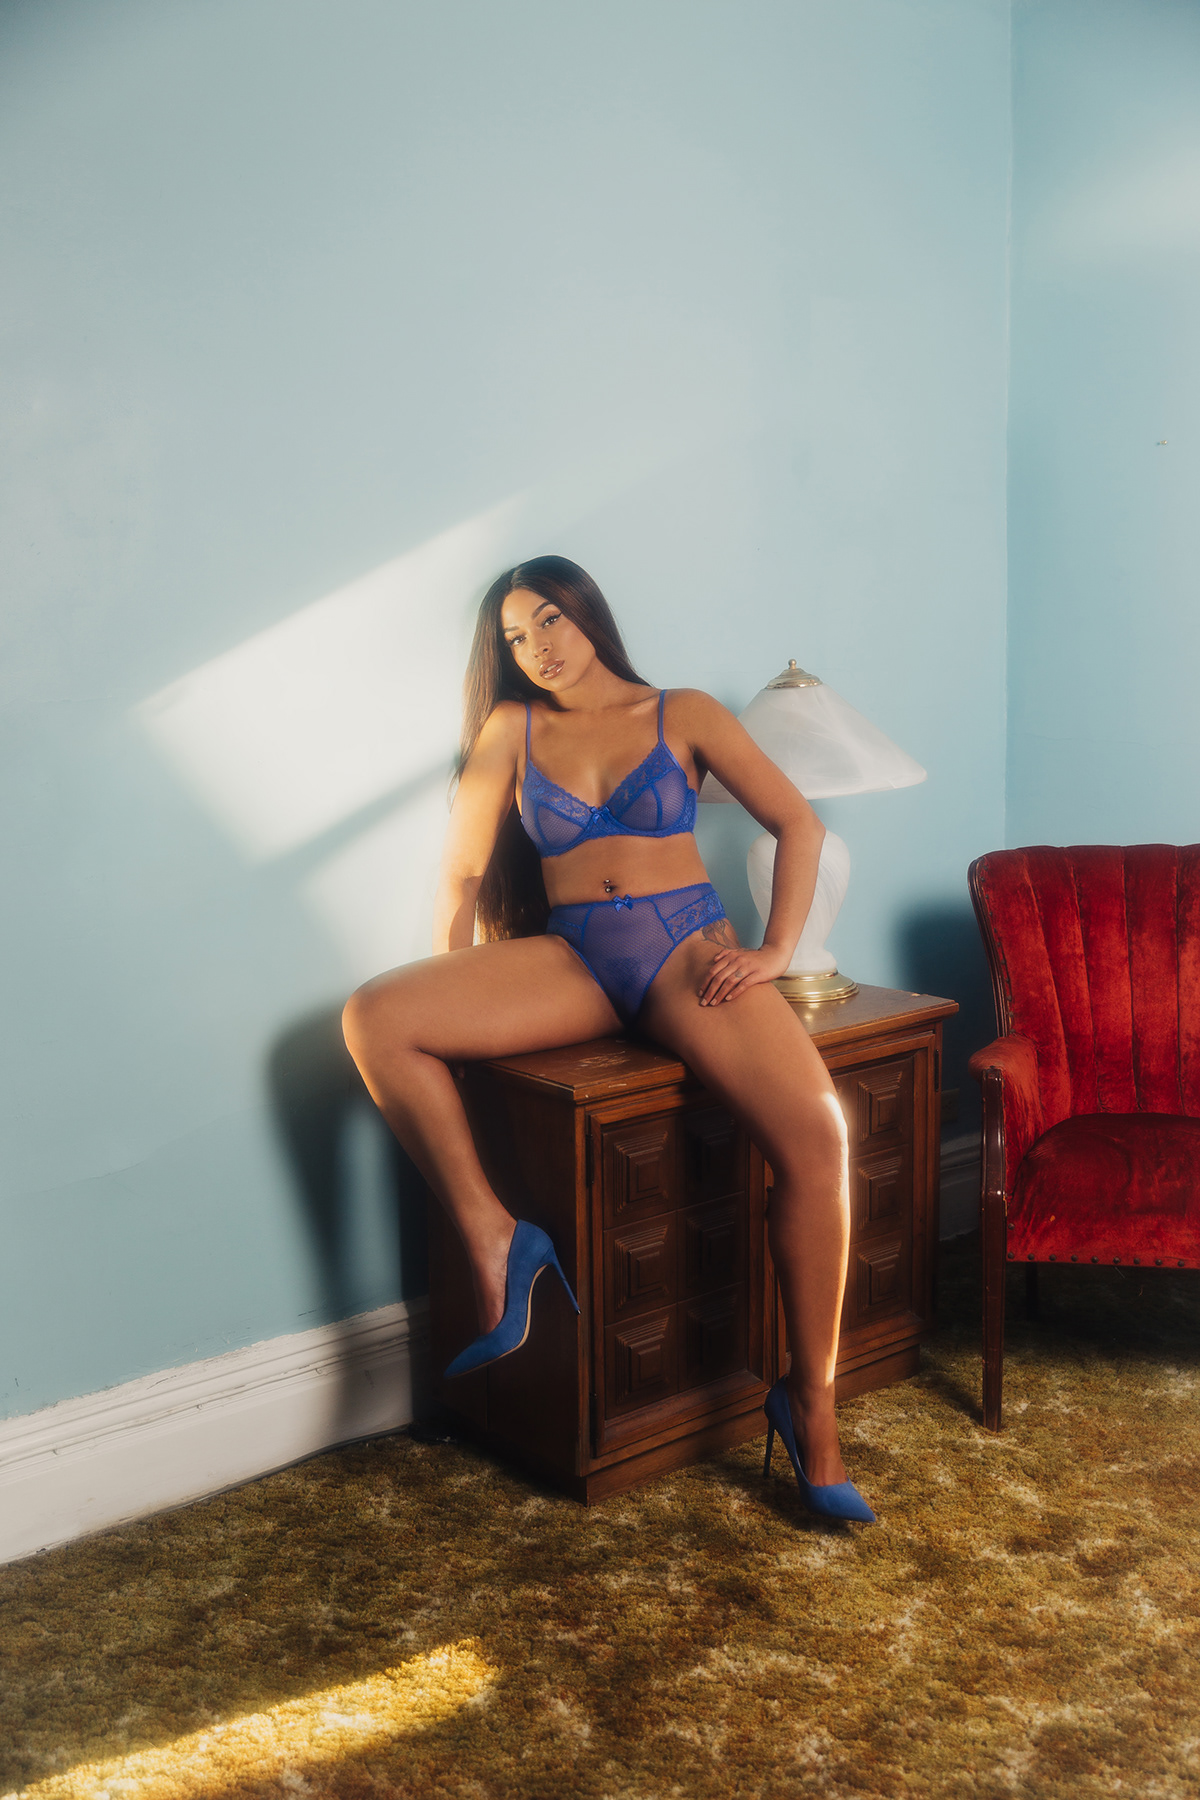 artist editorial lingerie musician New York photoshoot princess nokia savage fenty